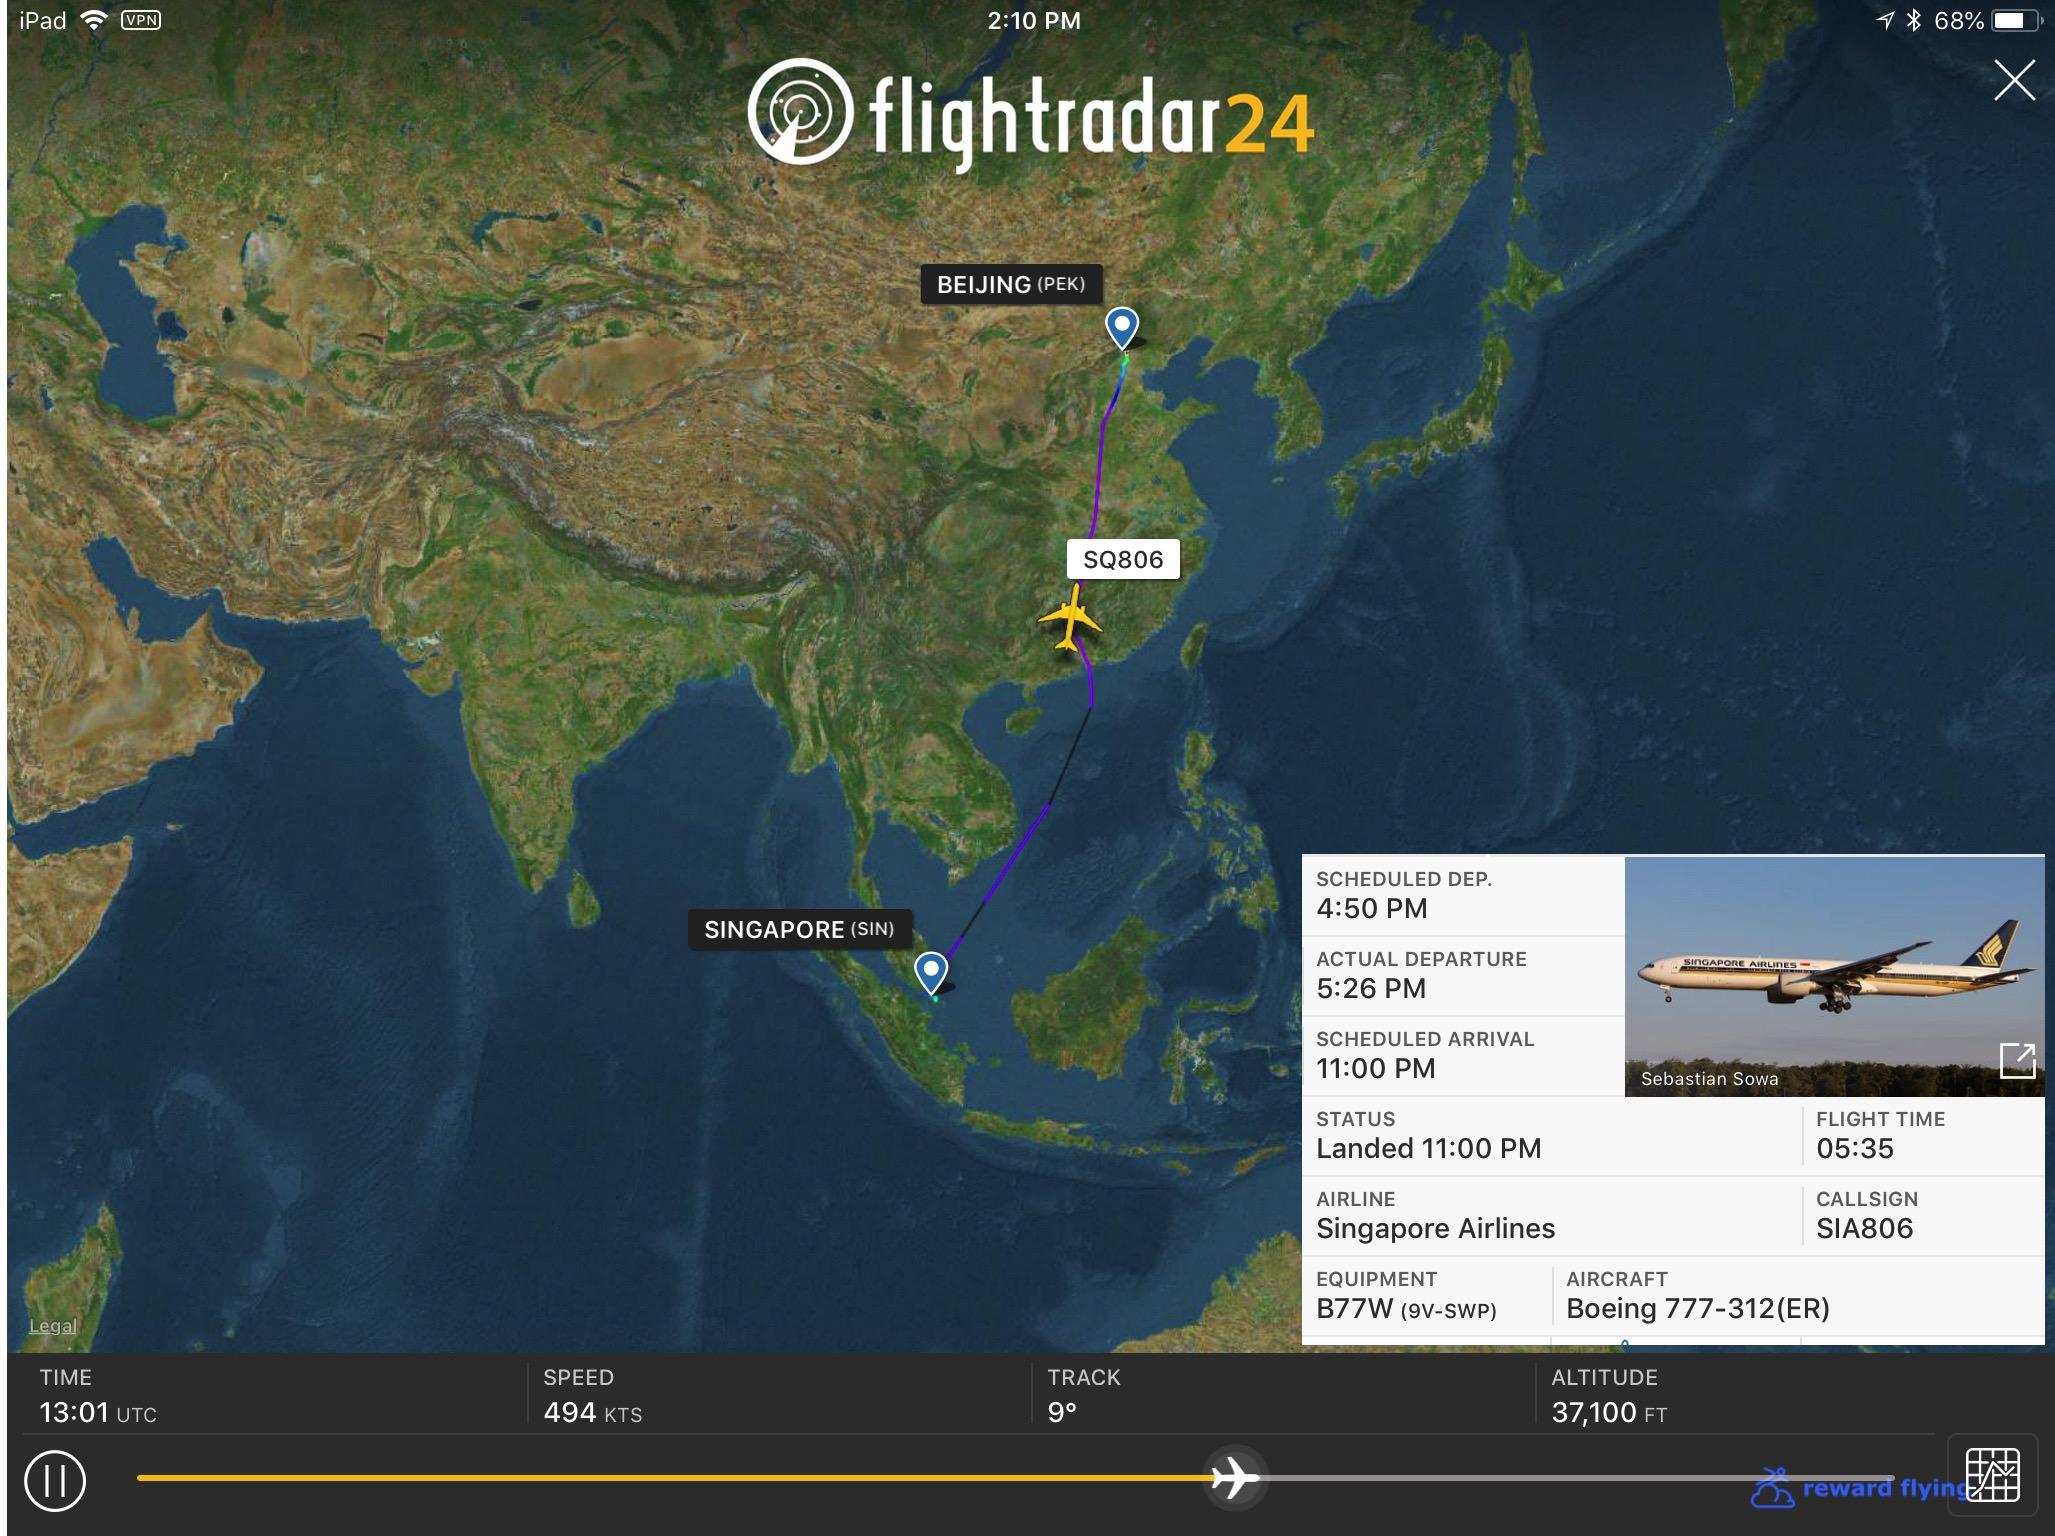 SQ806 Flightpath.jpg